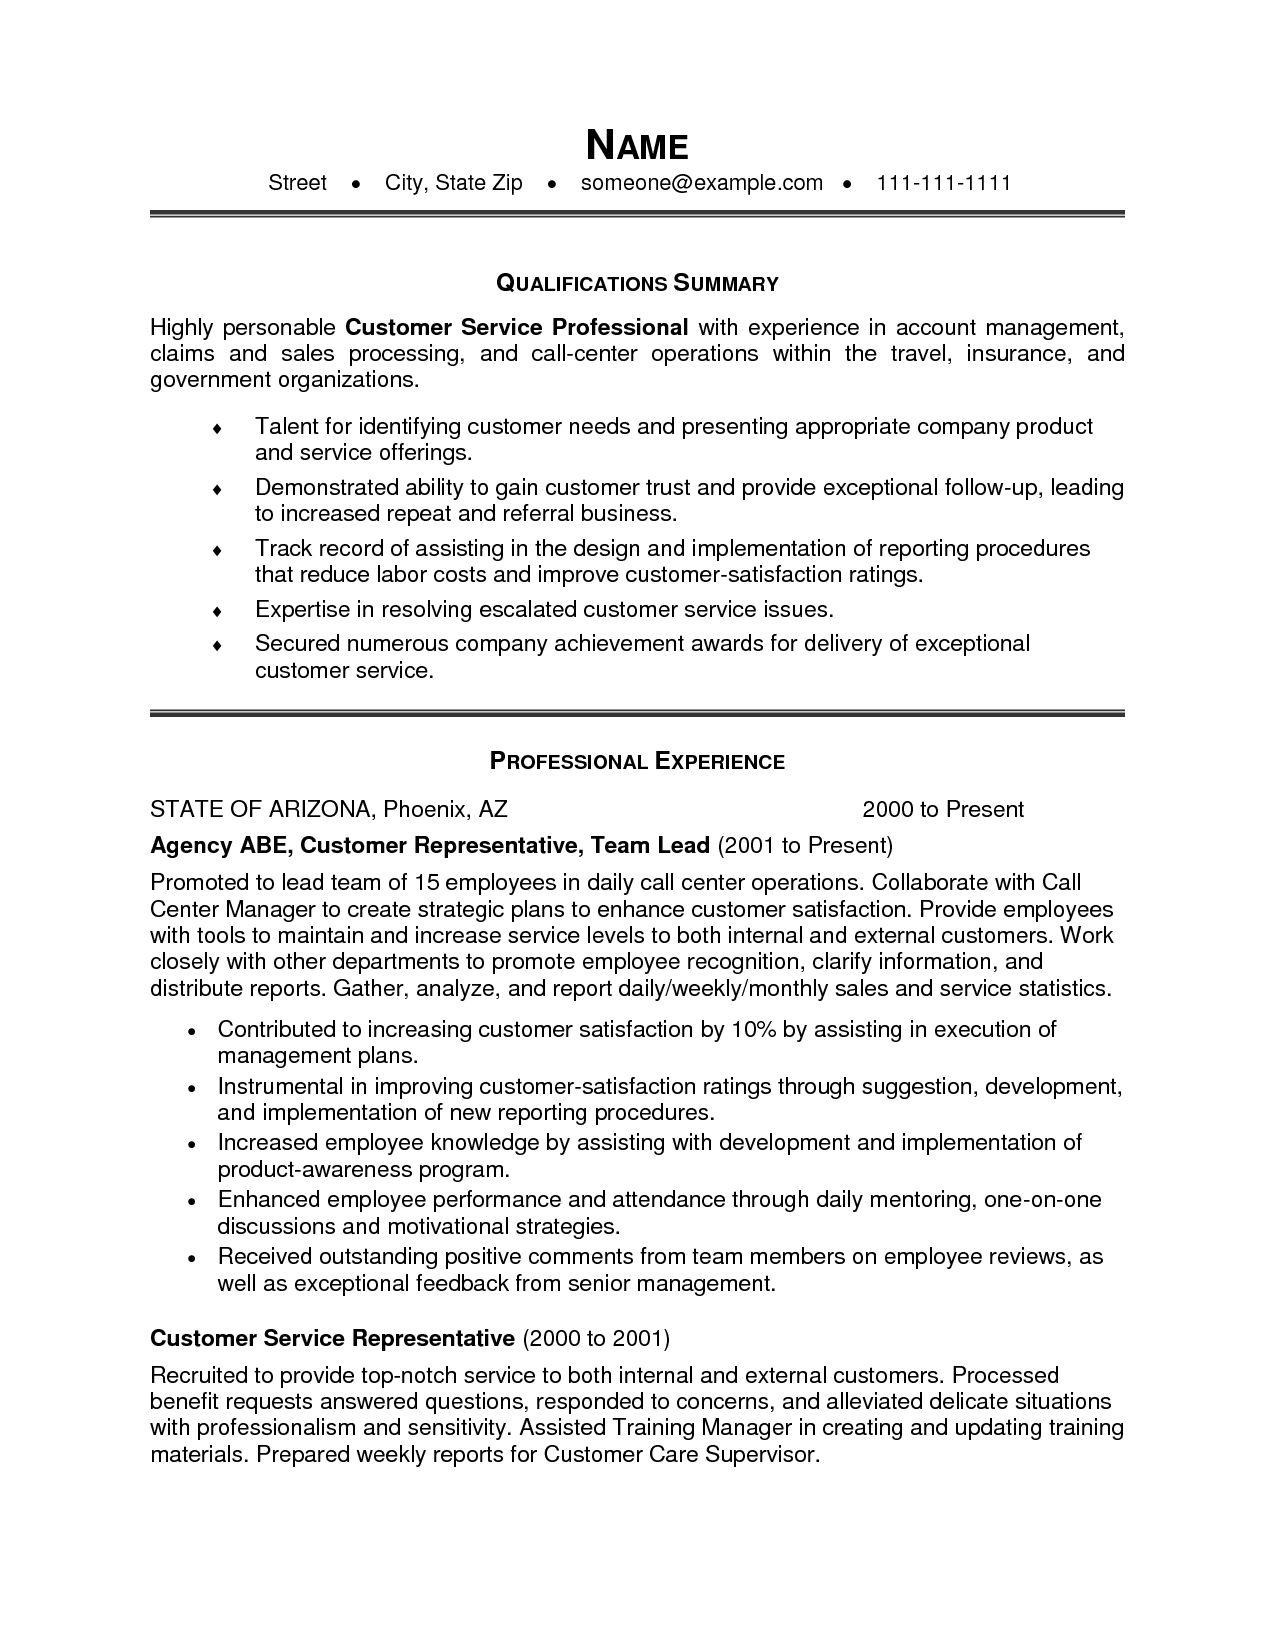 New Customer Service Resume Summary Examples Resume Template Online Customer Service Resume Customer Service Resume Examples Resume Summary